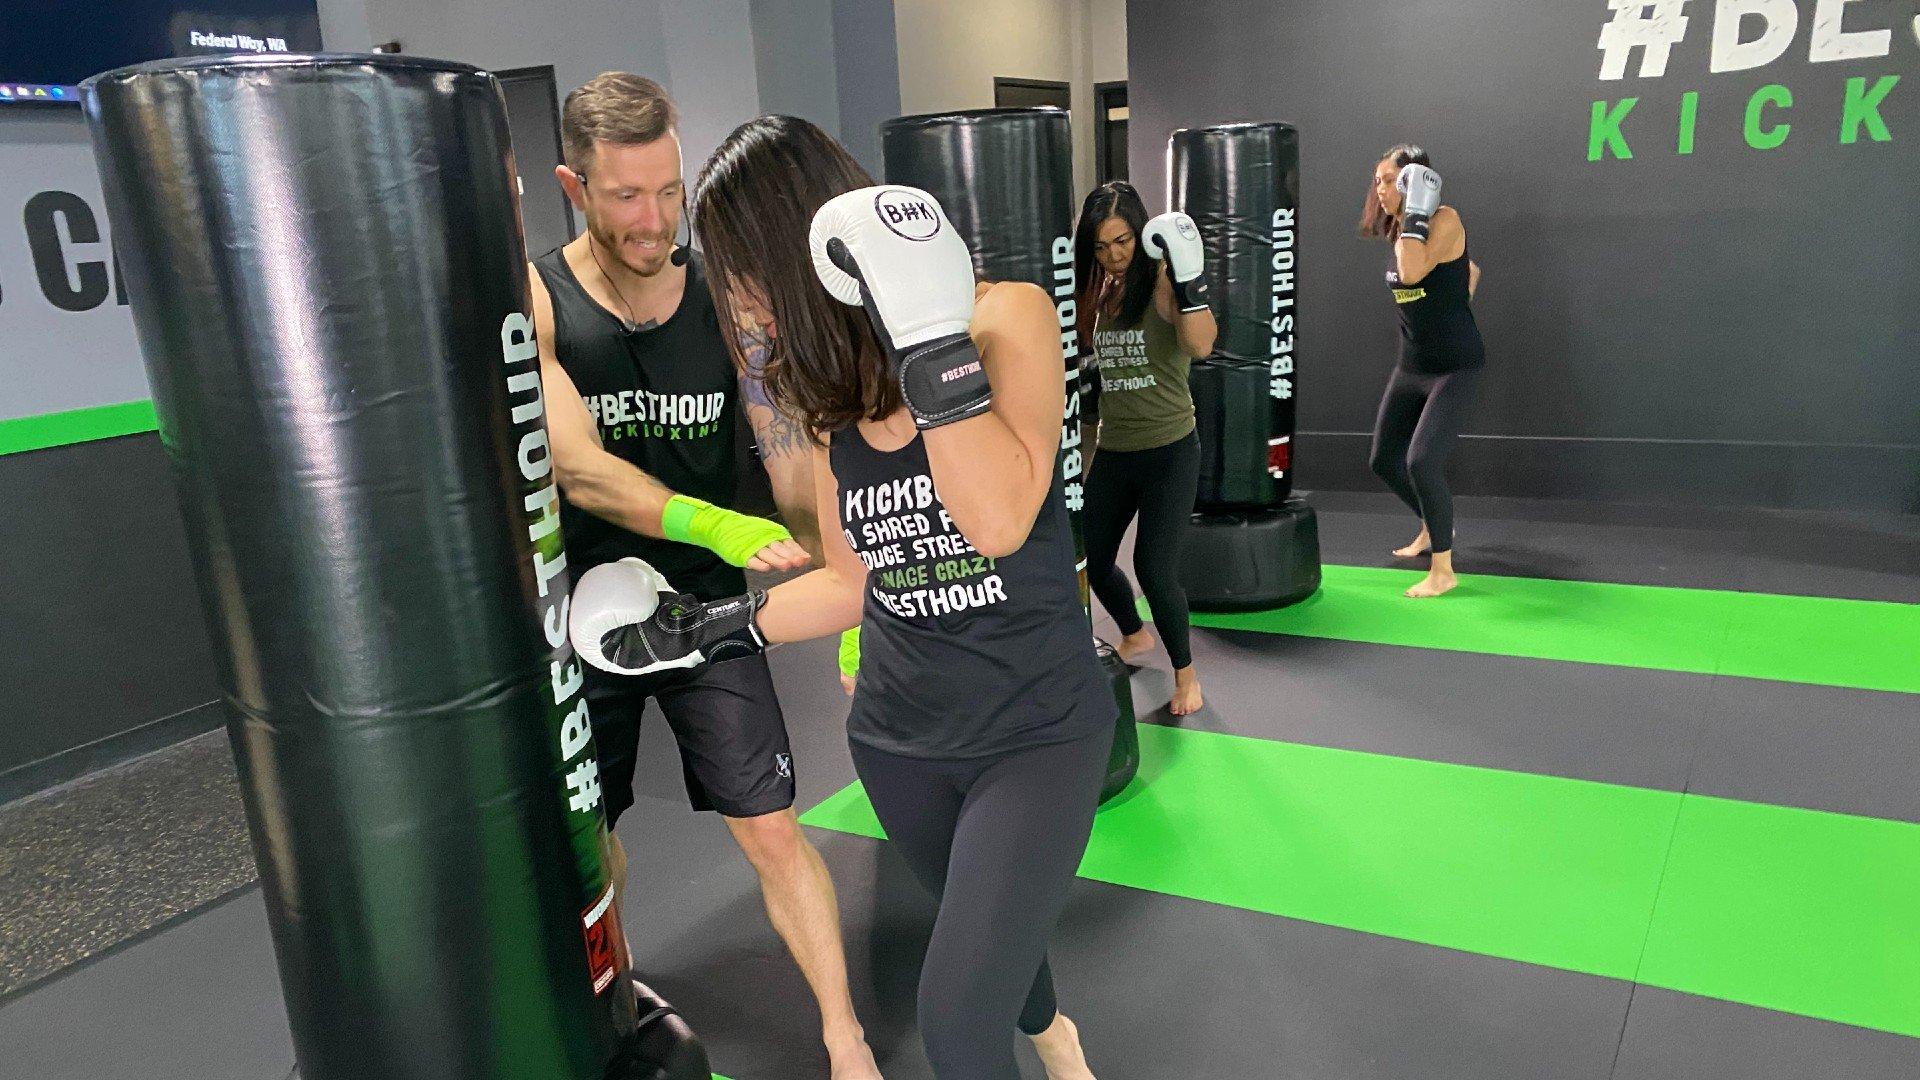 Kickboxing Beginner Class